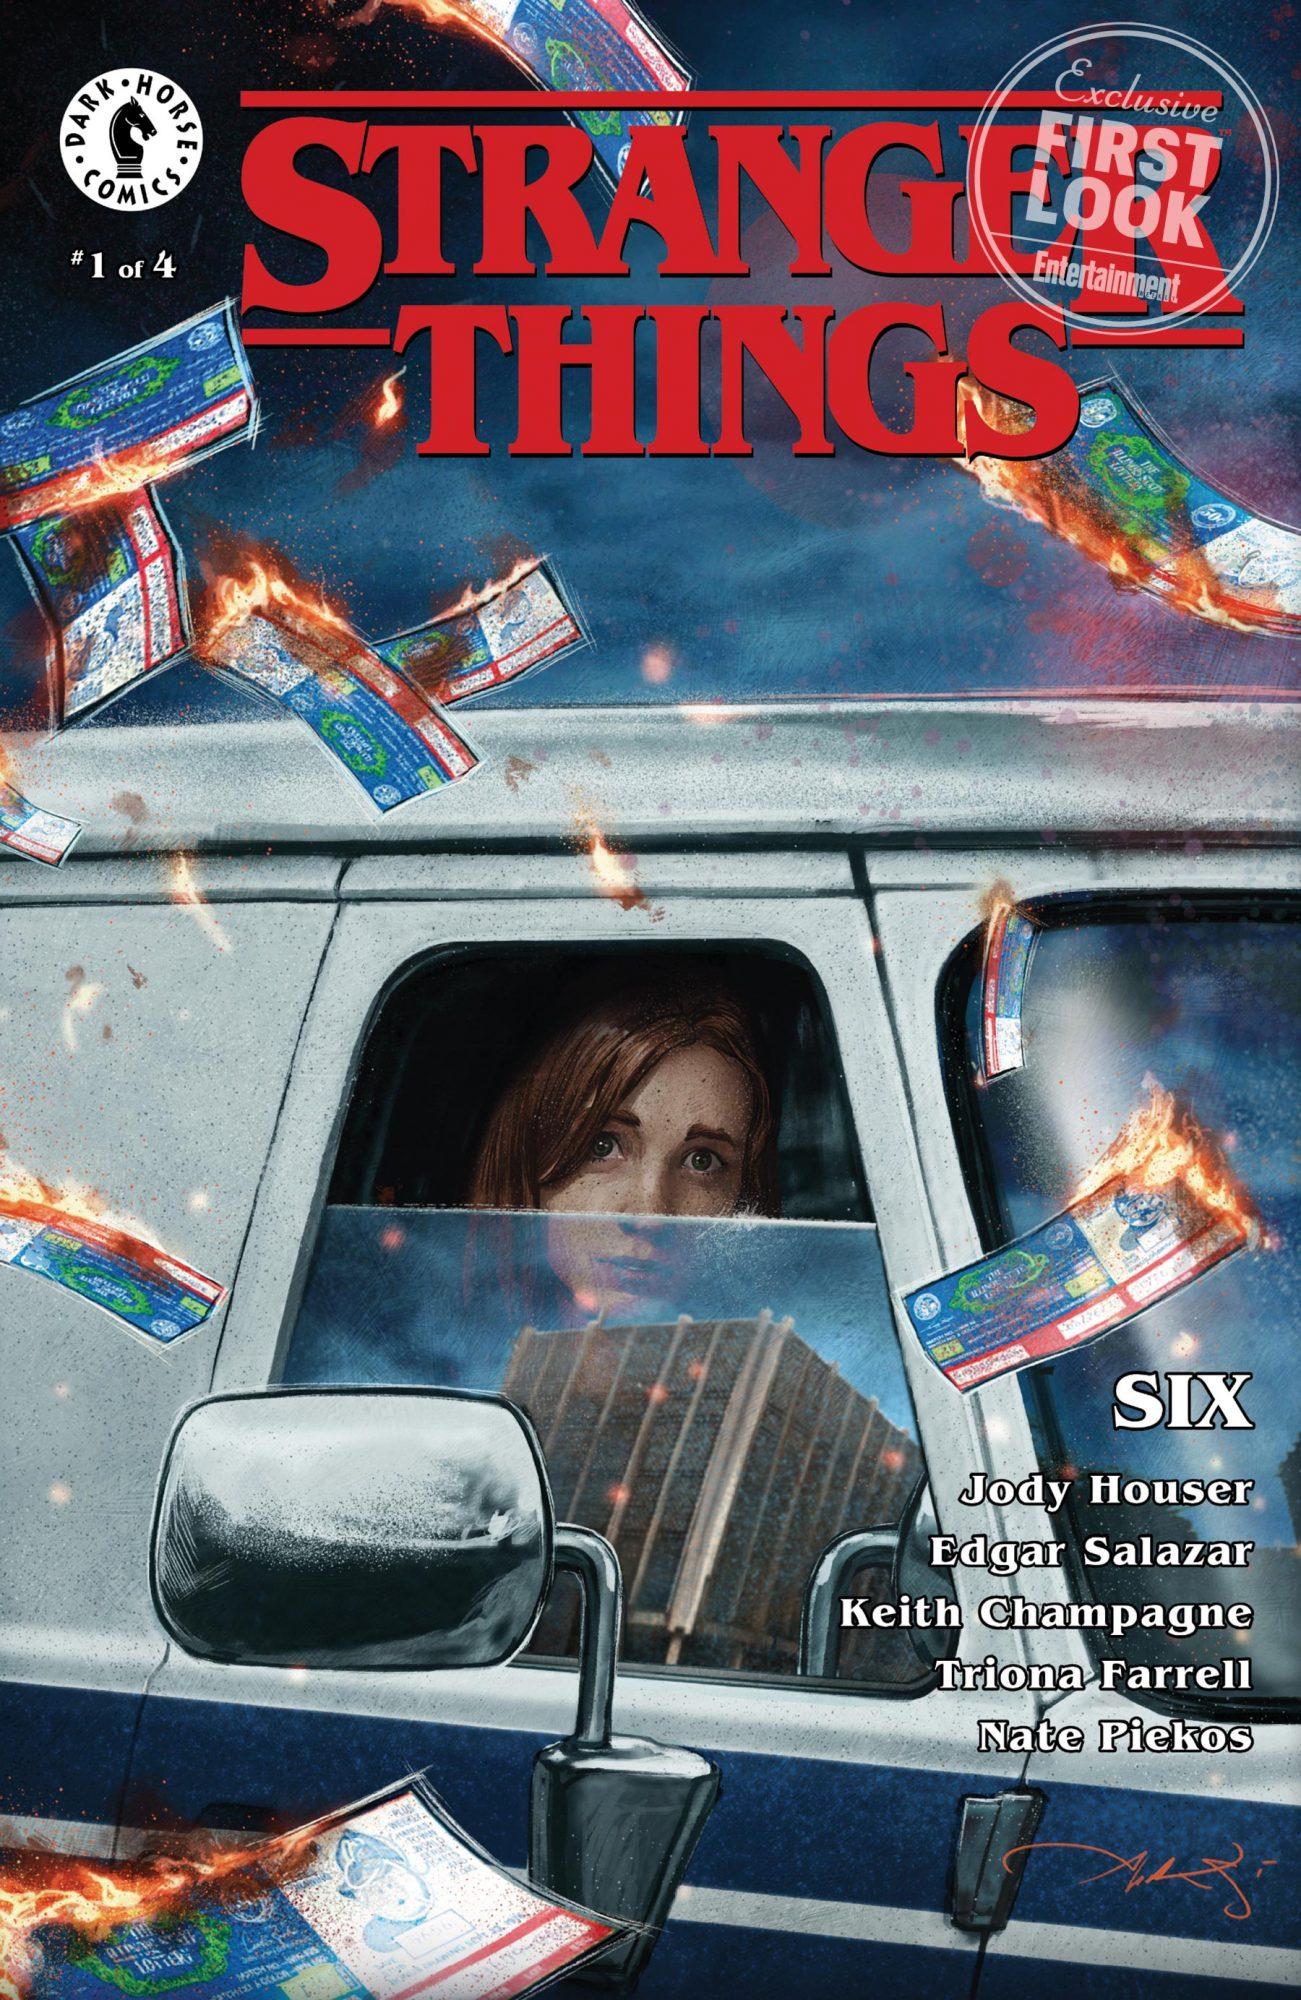 'Stranger Things' prequel comicCredit: Dark Horse